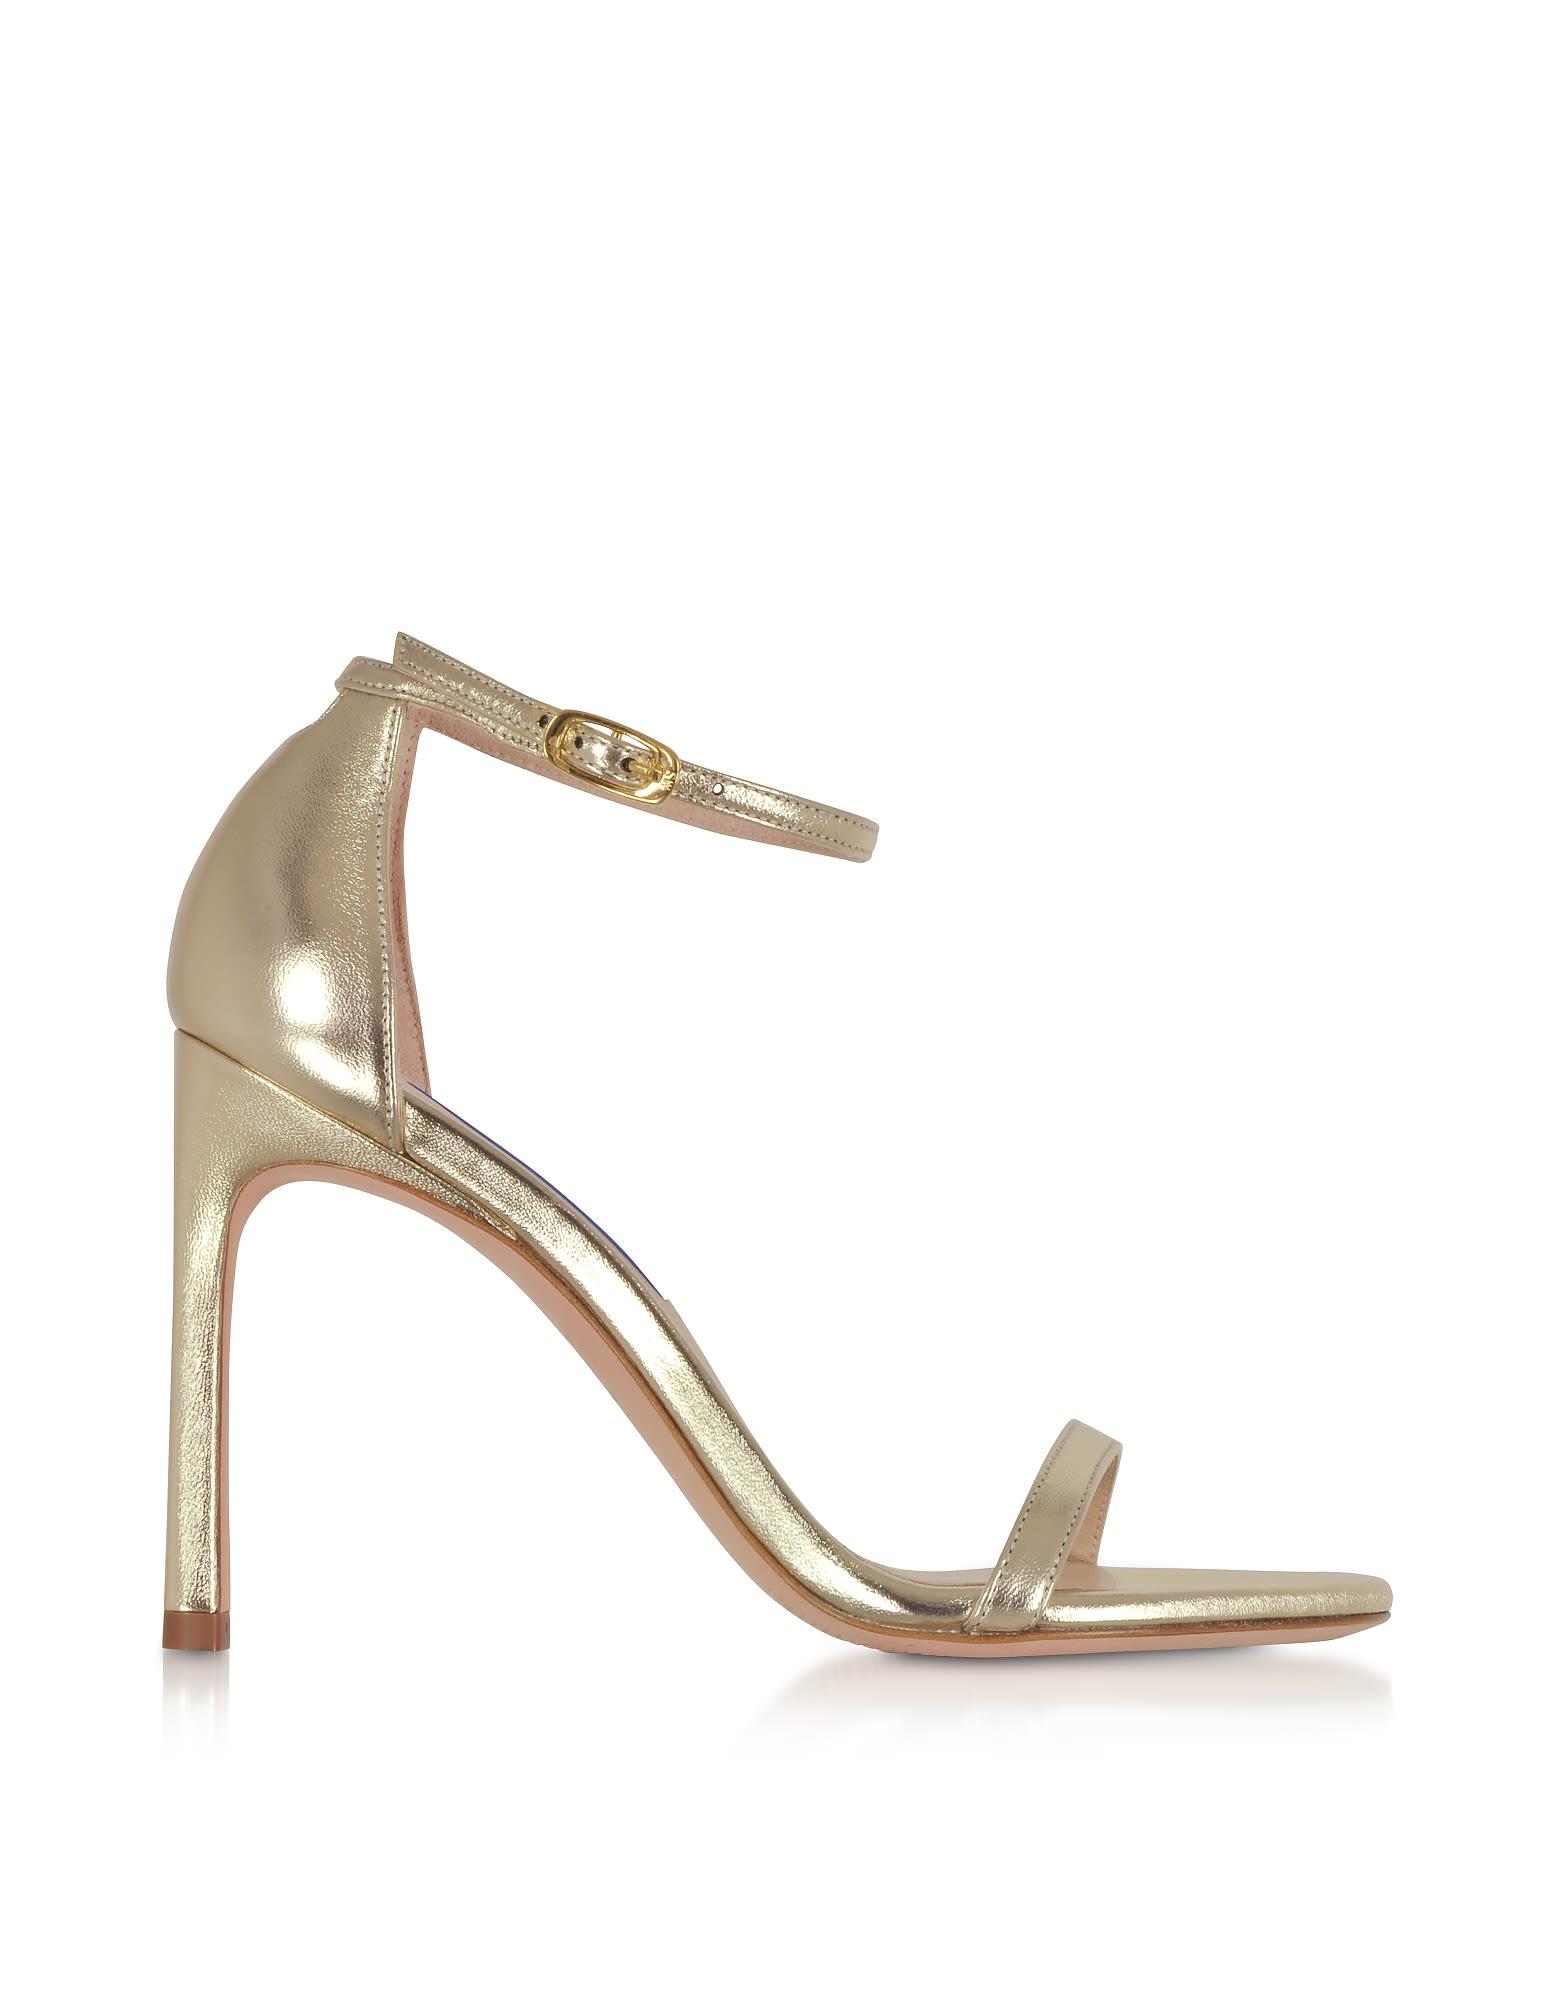 2ec672e62 Stuart Weitzman Nudistsong Platino Nappa Leather High Heel Sandals -  Platinum ...